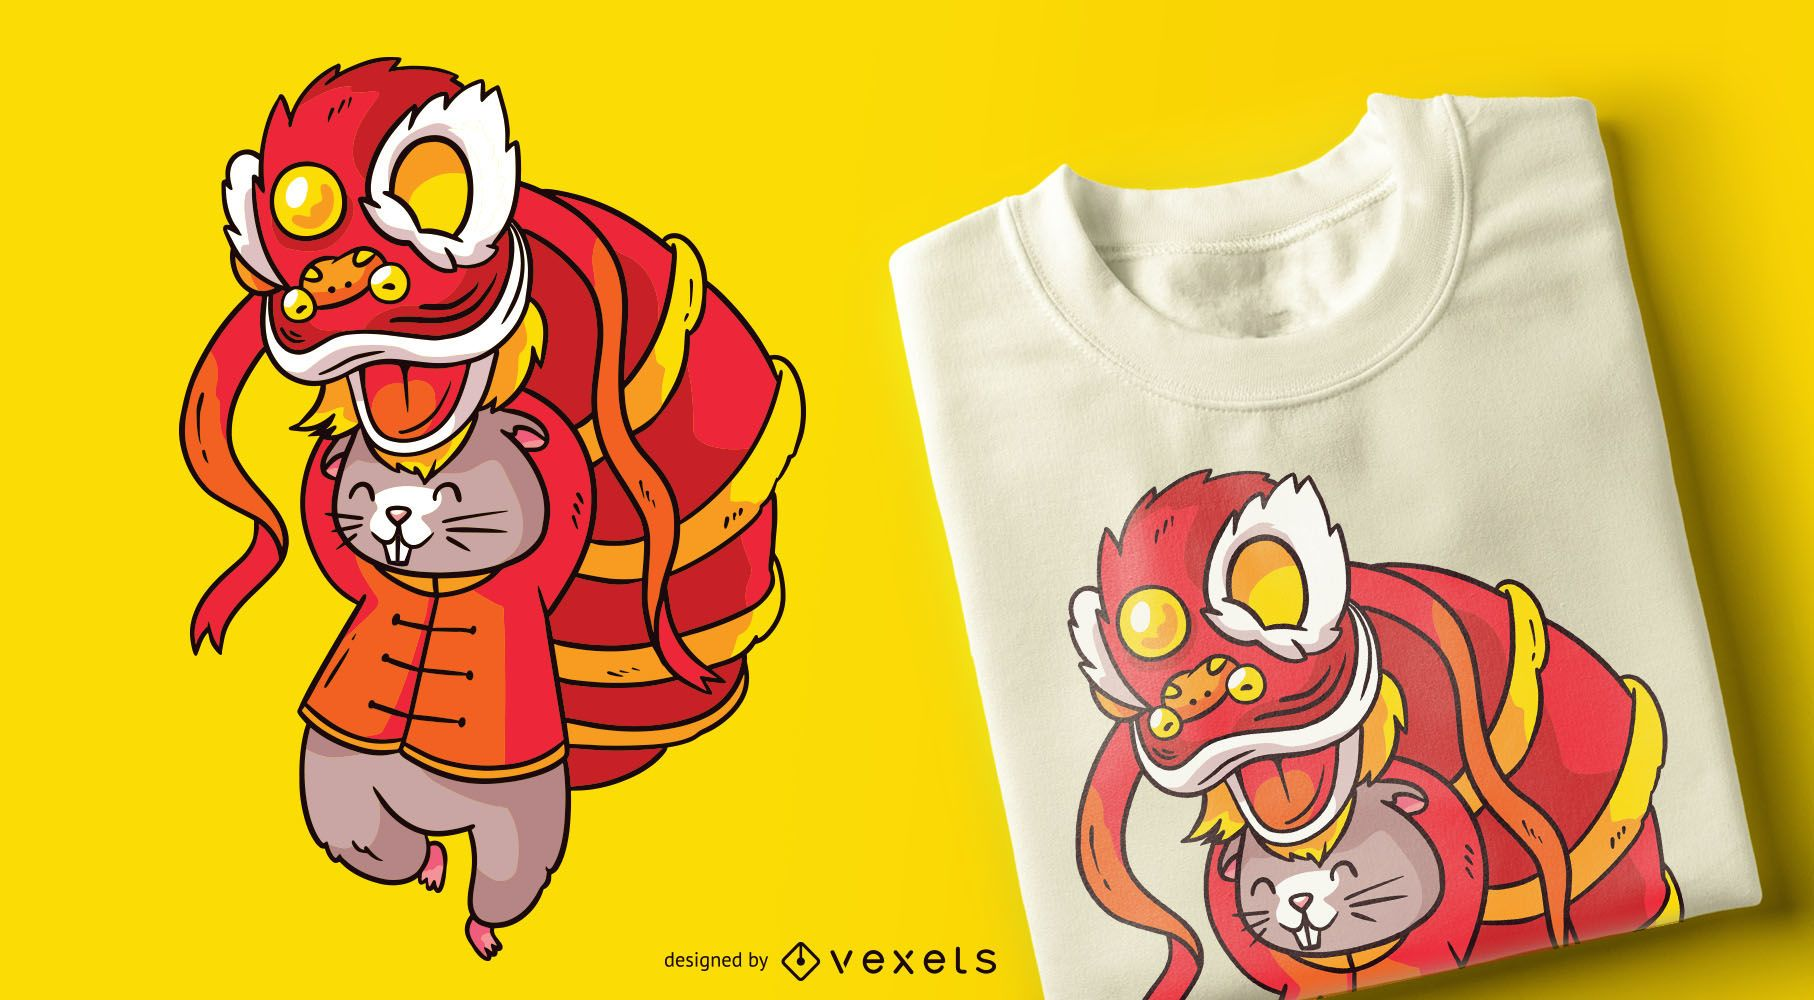 Chinese Rat Lion Dancer T-shirt Design